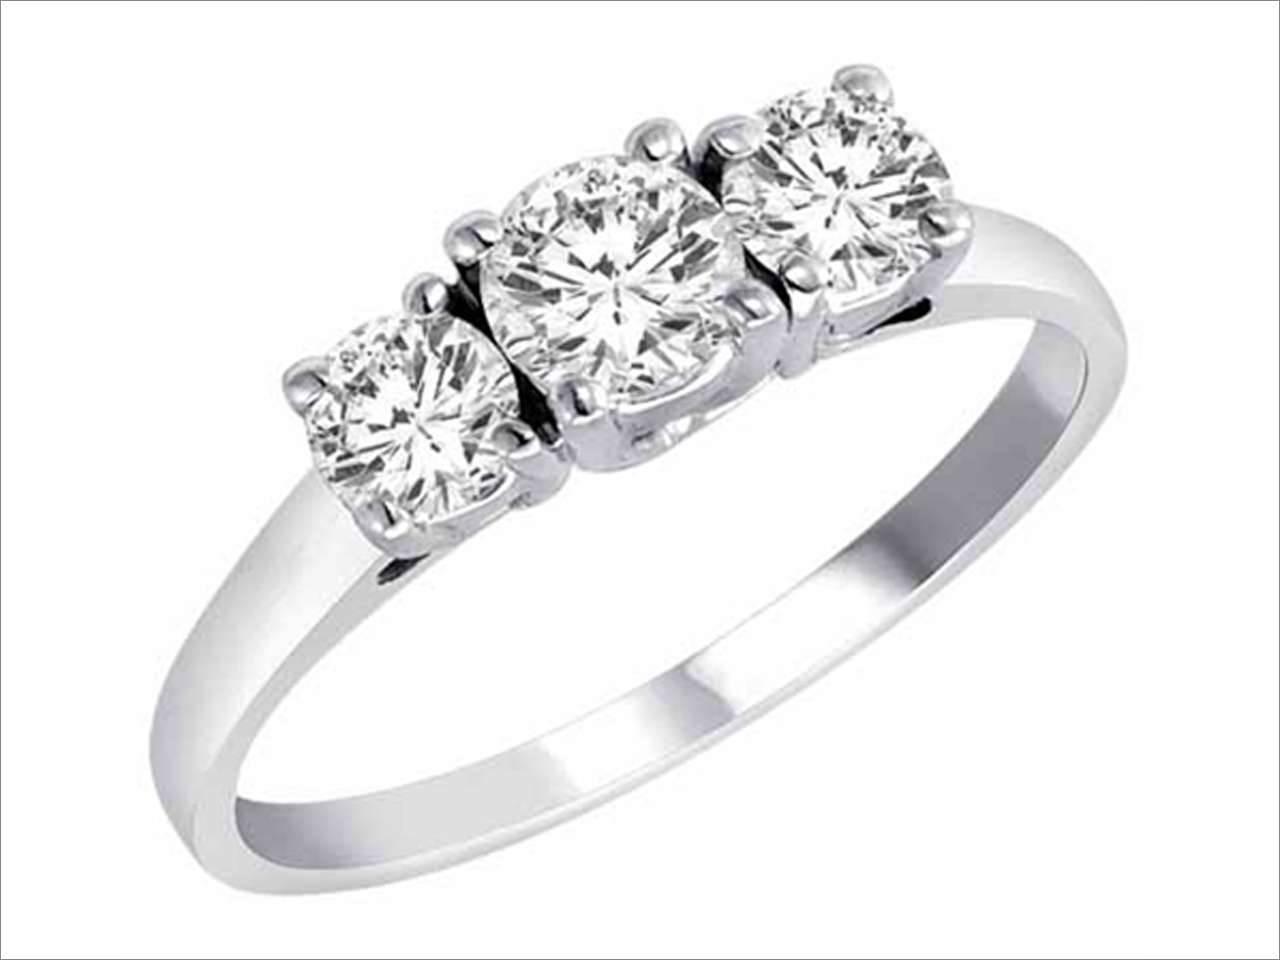 Ryan Jonathan Lucido 3 Three Stone Brilliant Diamond Anniversary Intended For Latest 5 Diamond Anniversary Rings (View 16 of 25)